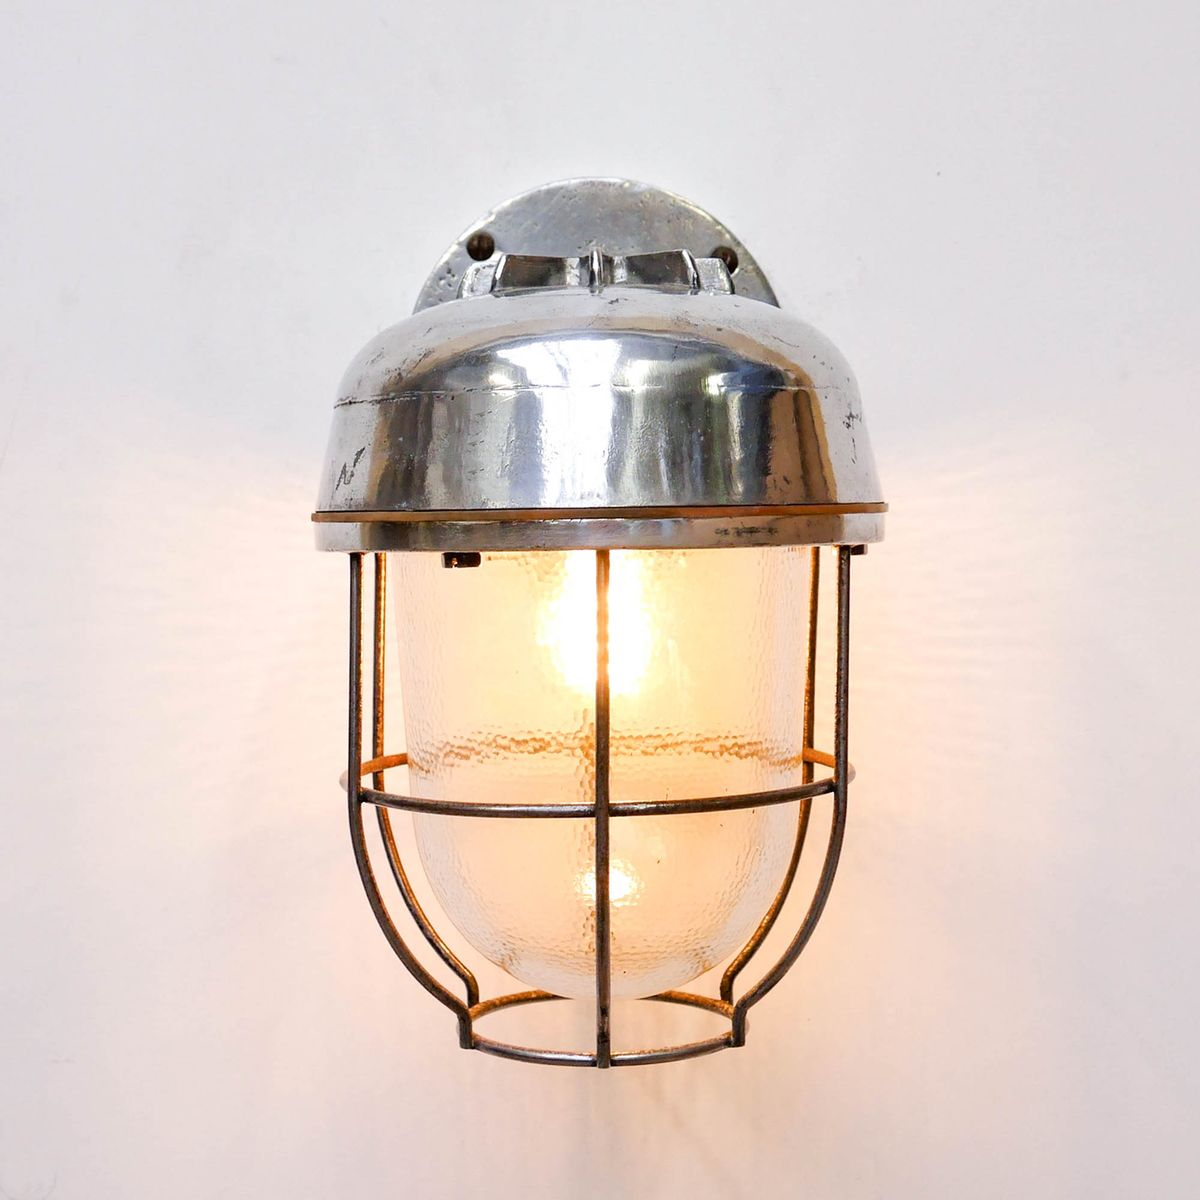 vintage laternen wandlampe bei pamono kaufen. Black Bedroom Furniture Sets. Home Design Ideas